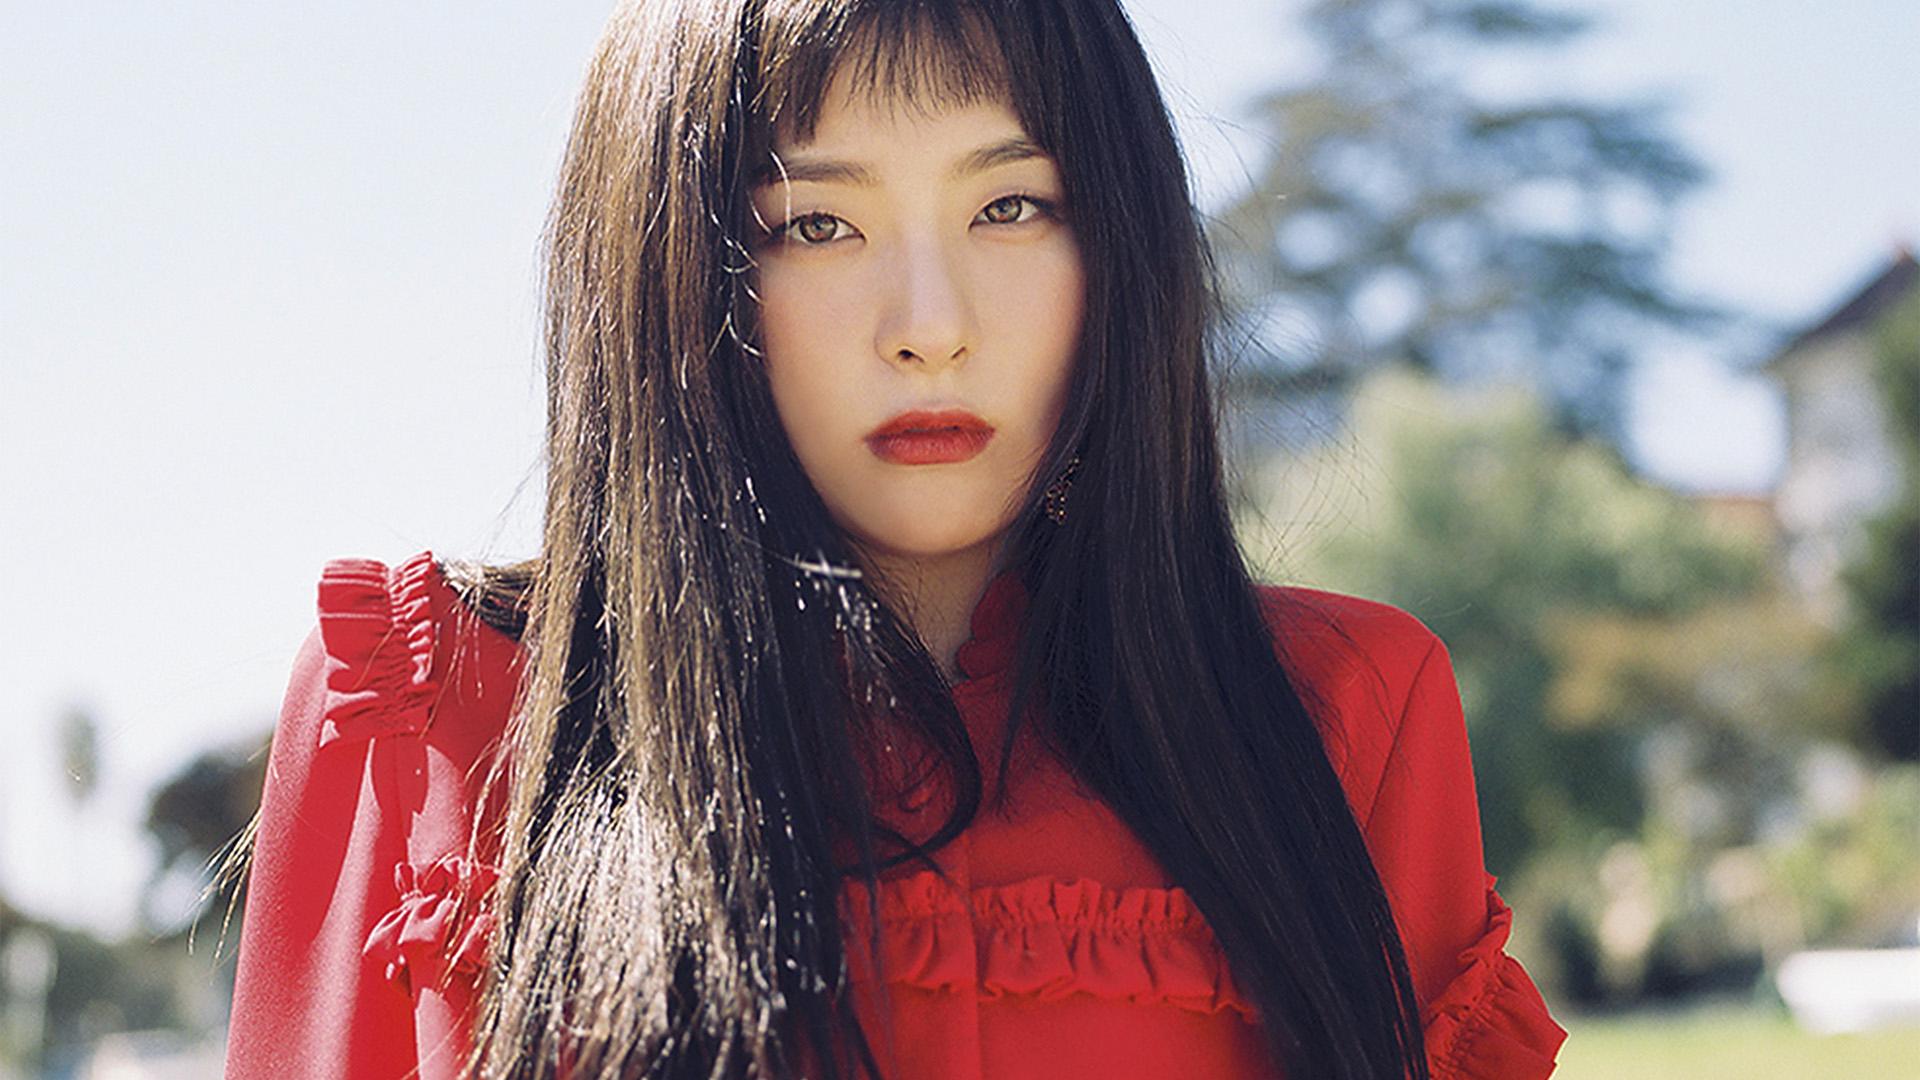 Droid X Girl Wallpaper Ho85 Kpop Girl Red Dress Wallpaper